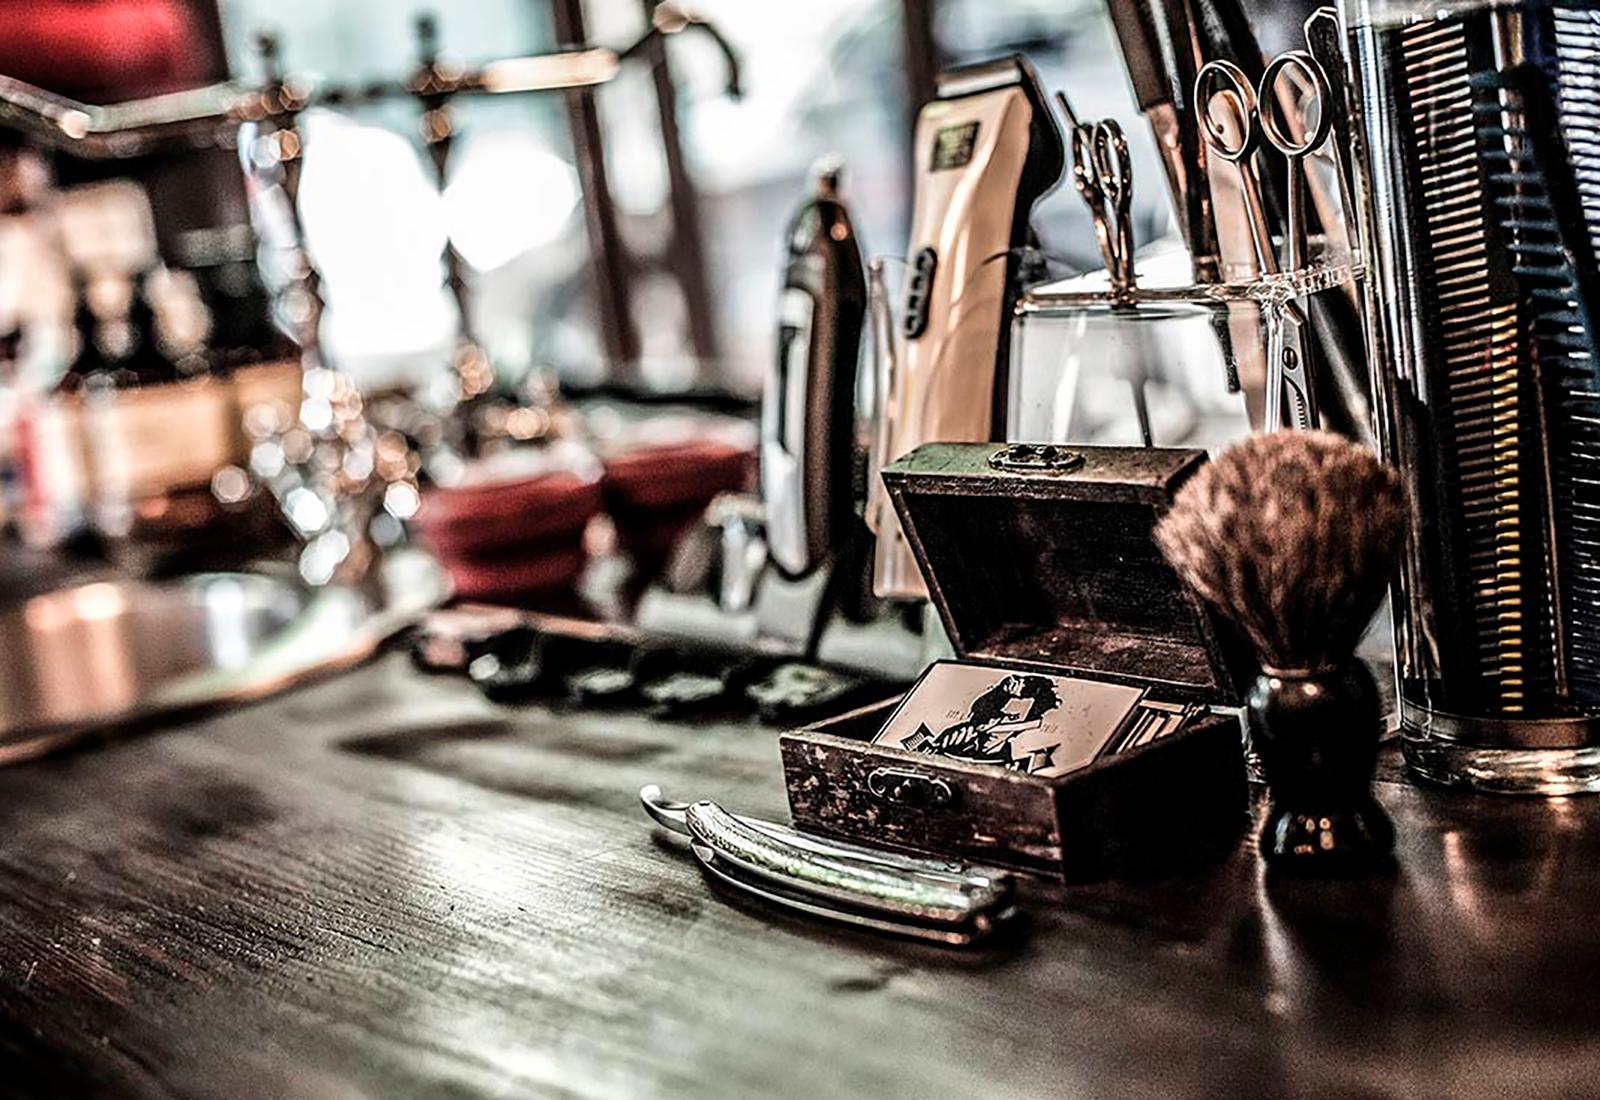 Nuestras Barber Shops Favoritas En EEUU